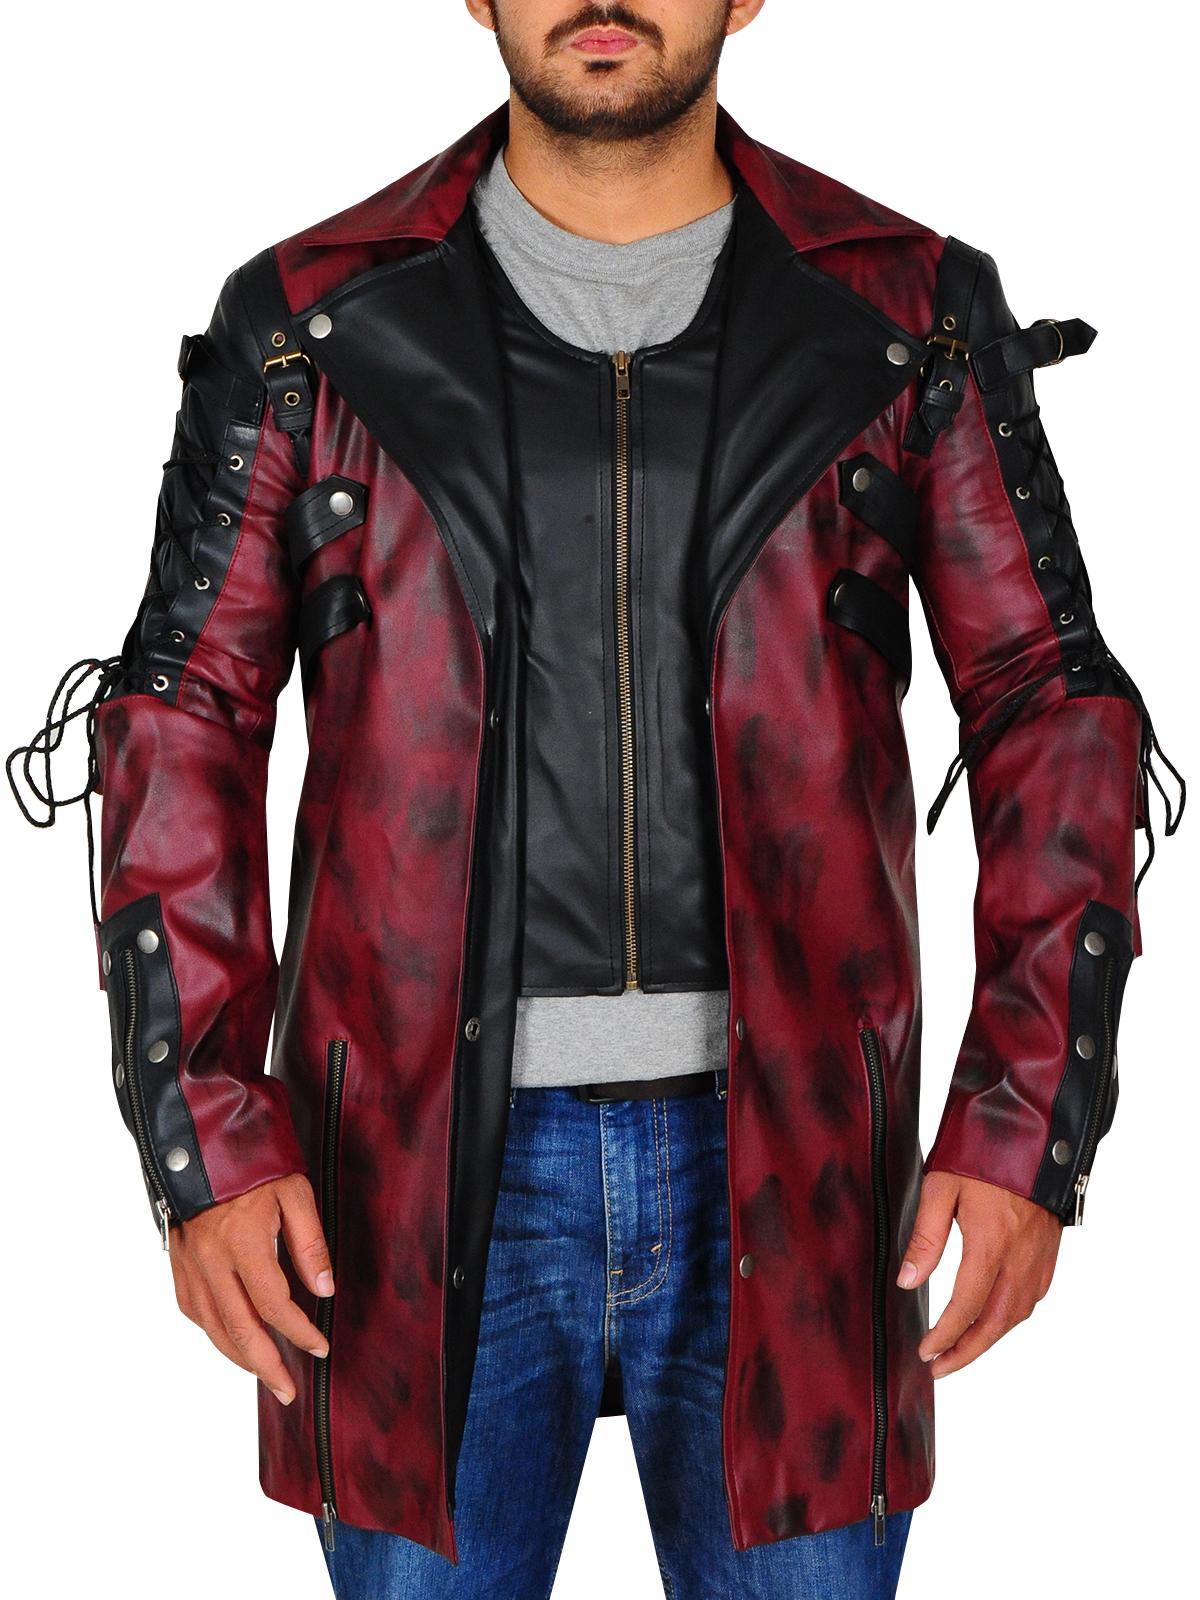 Punk Rave Poison Goth Steampunk Faux Leather Long Coat